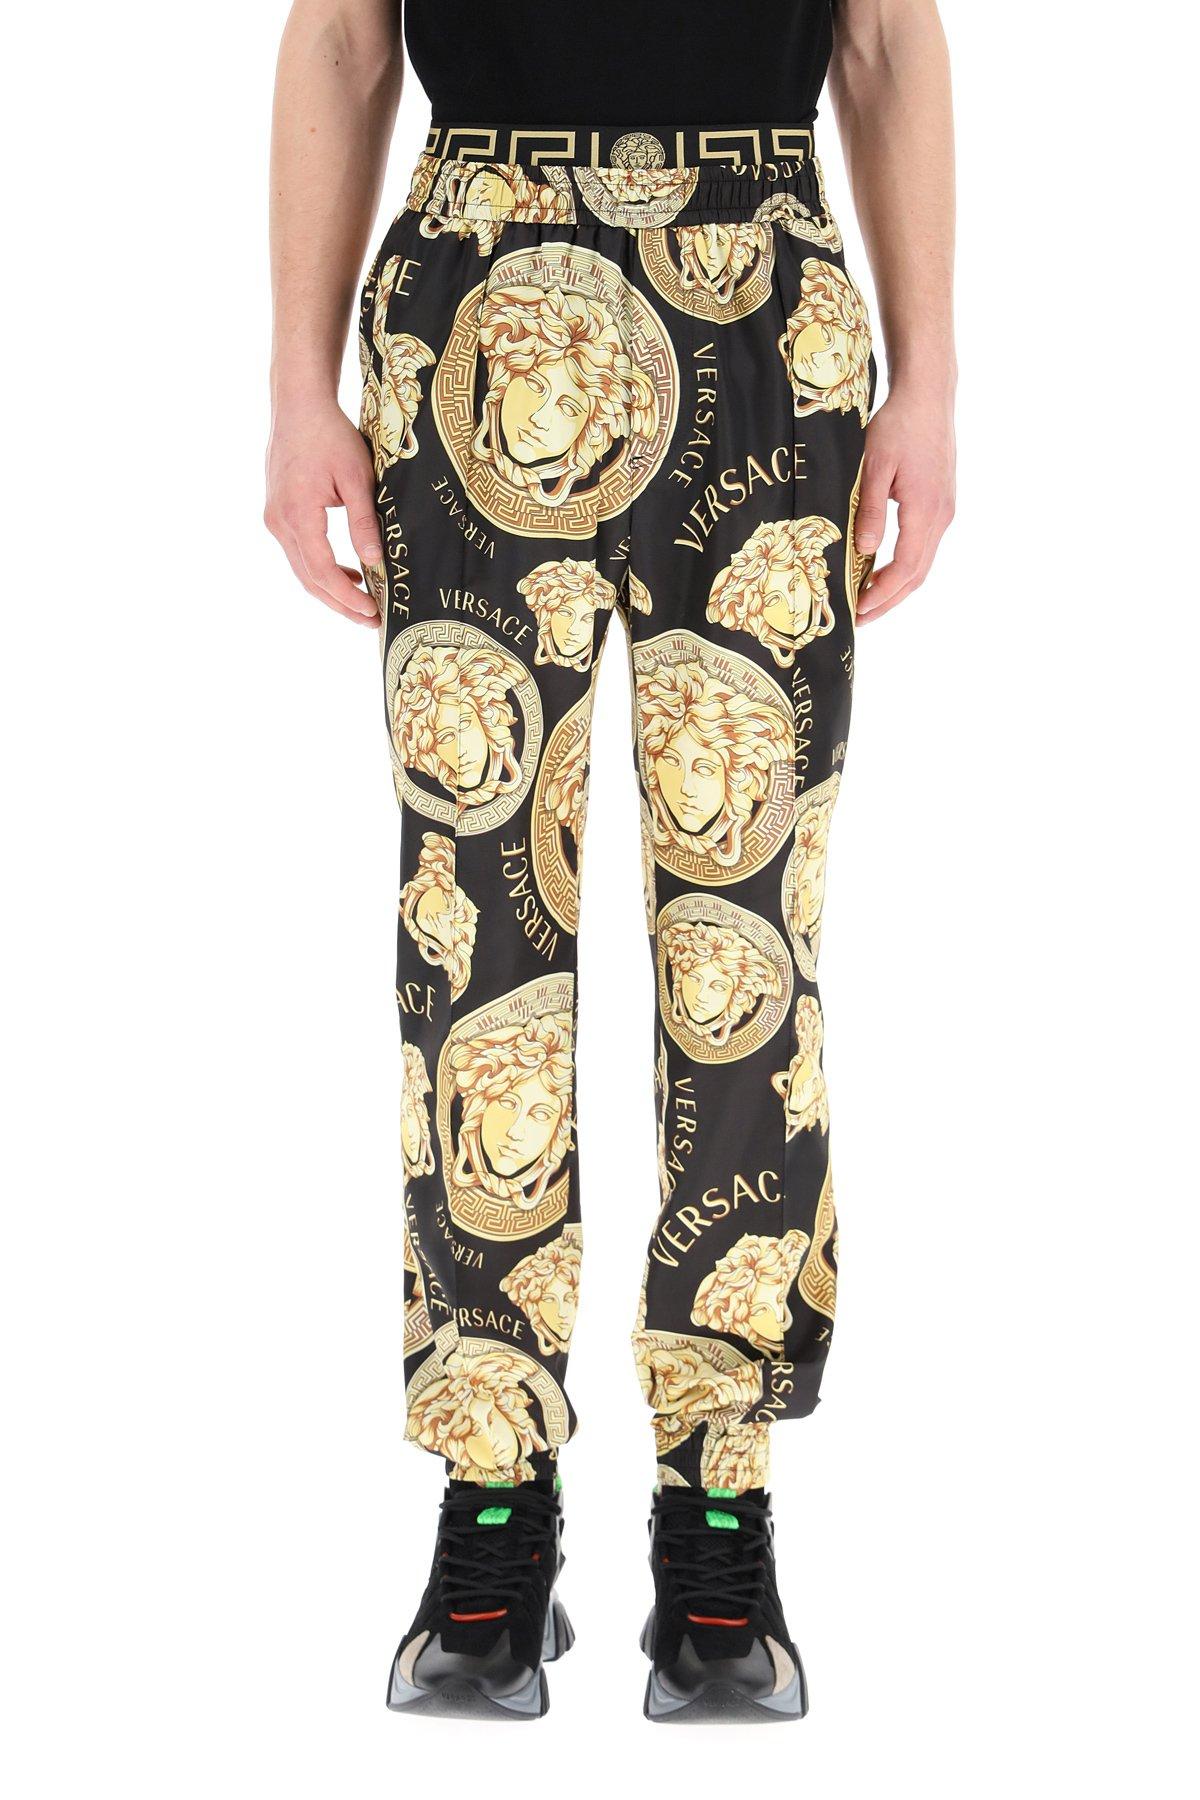 Versace pantaloni con stampa medusa amplified